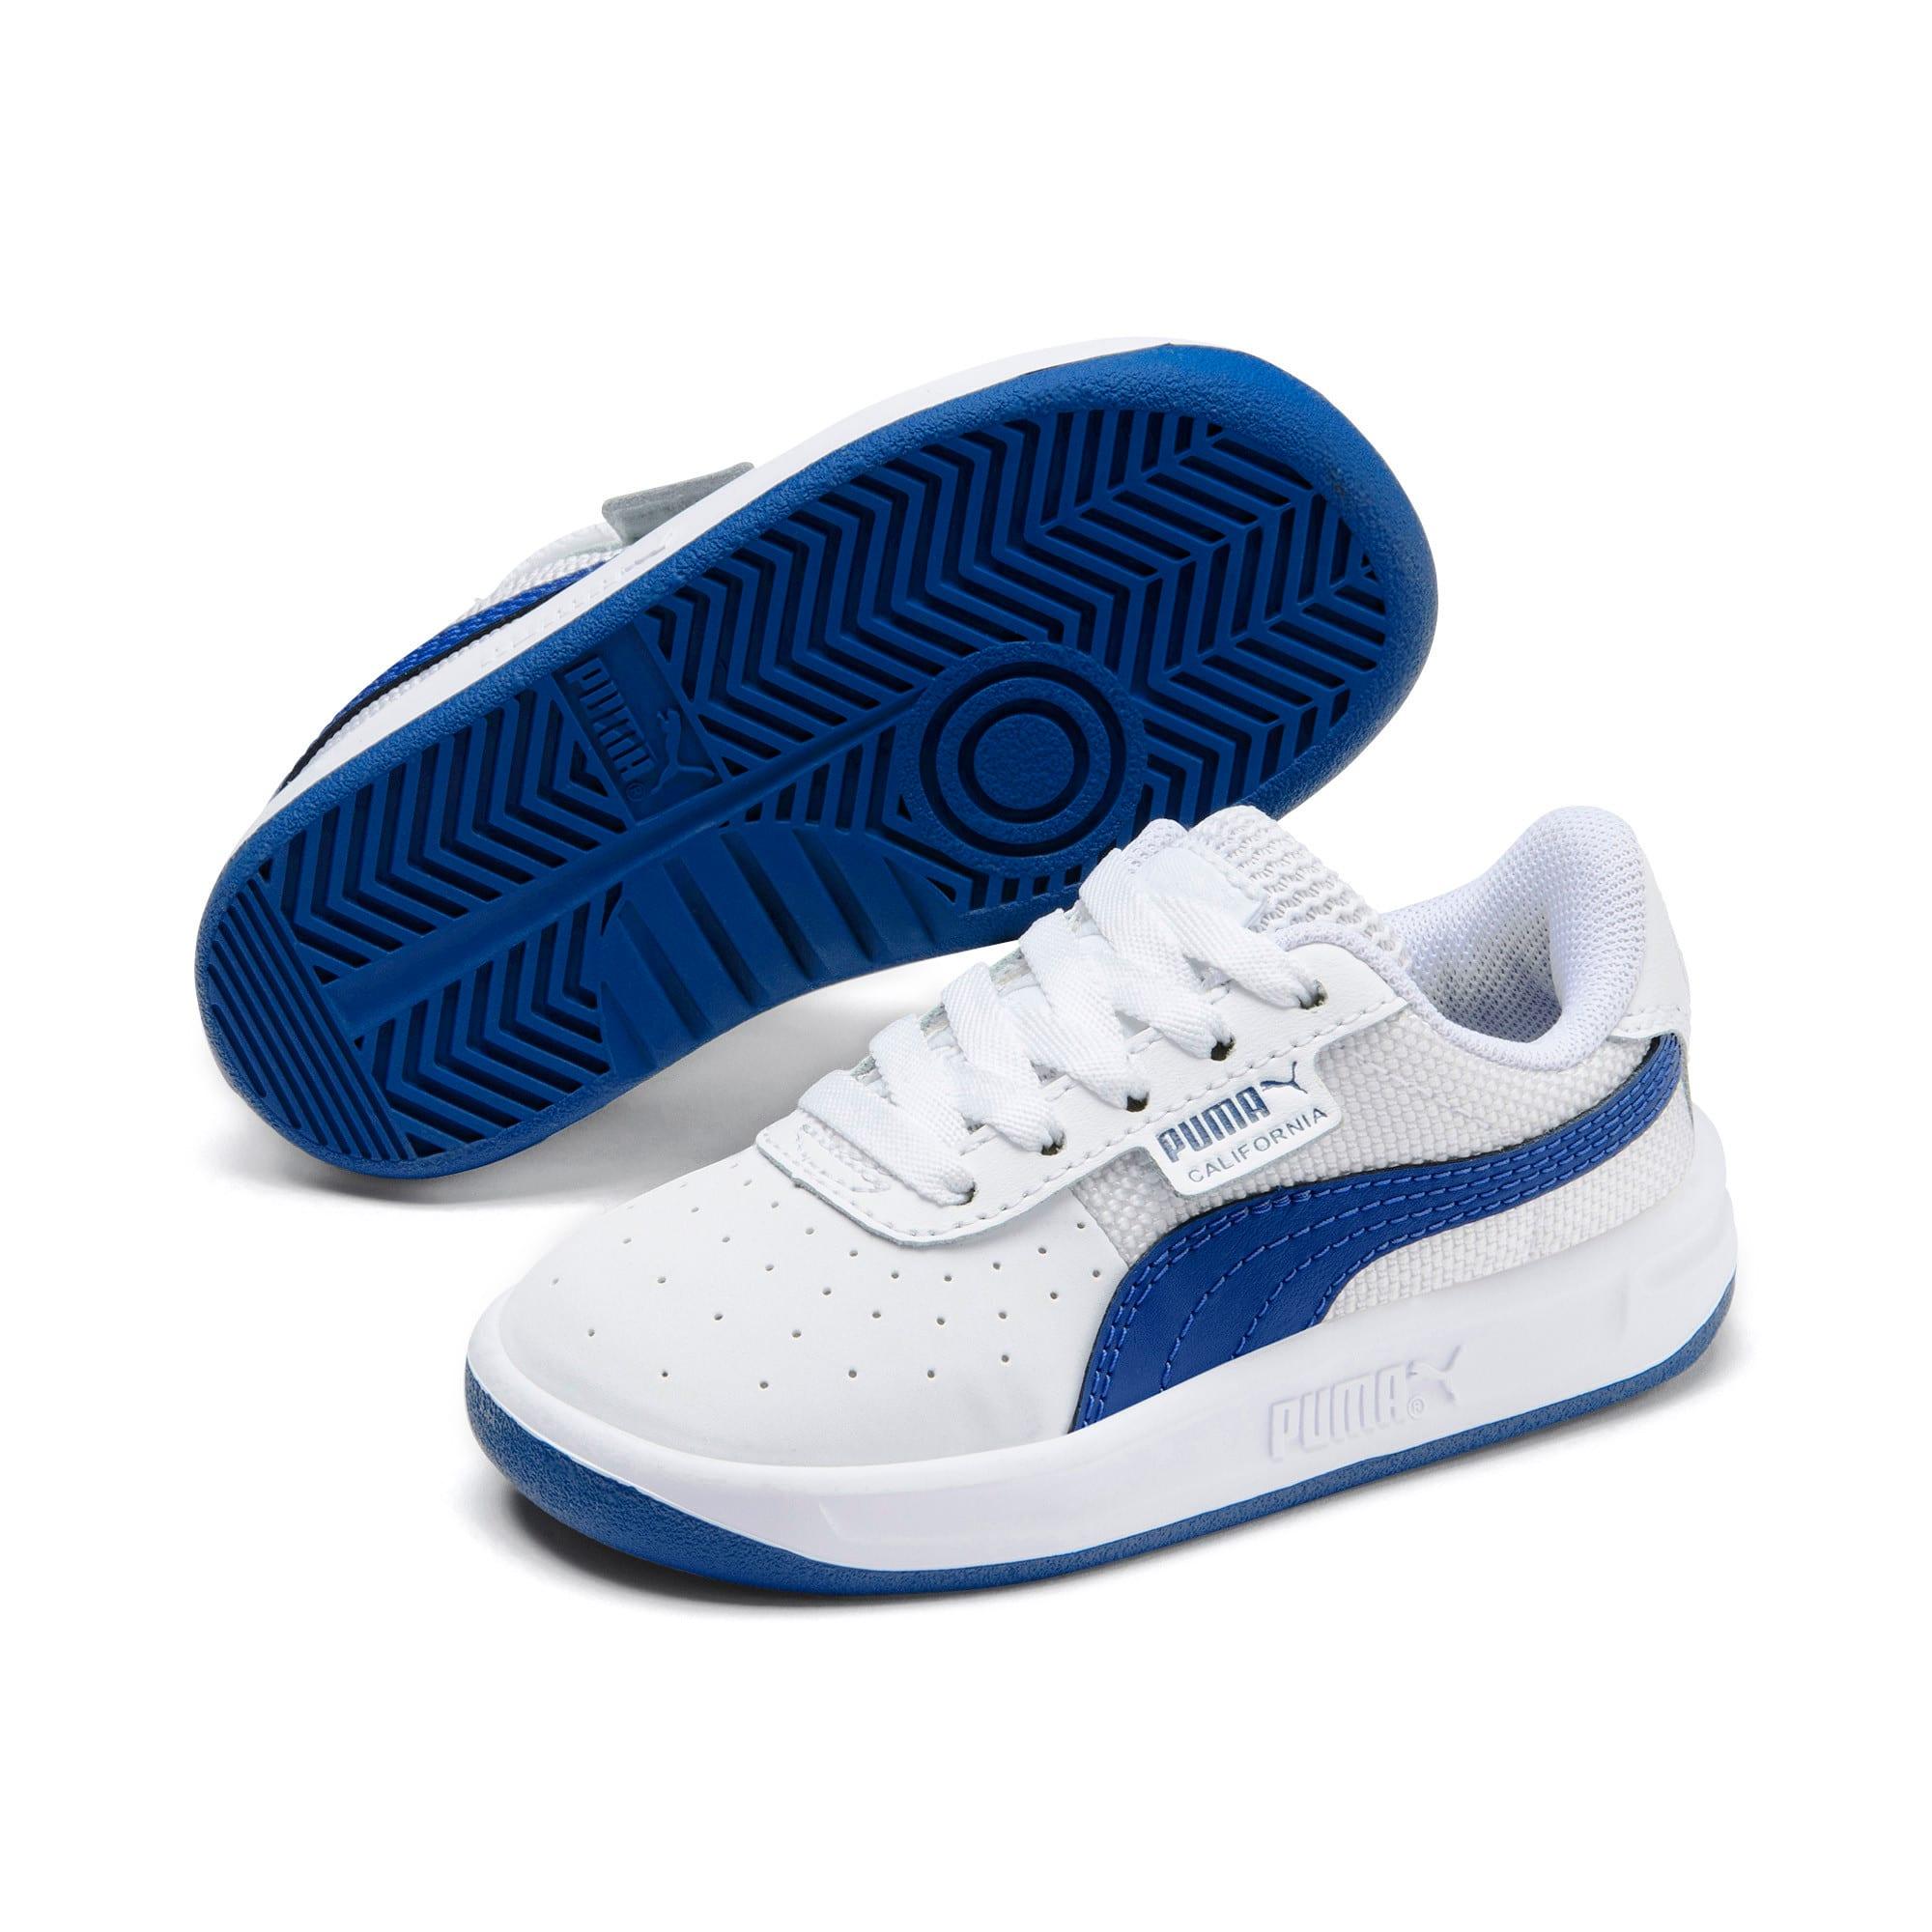 Thumbnail 2 of California Toddler Shoes, Puma White-Galaxy Blue, medium